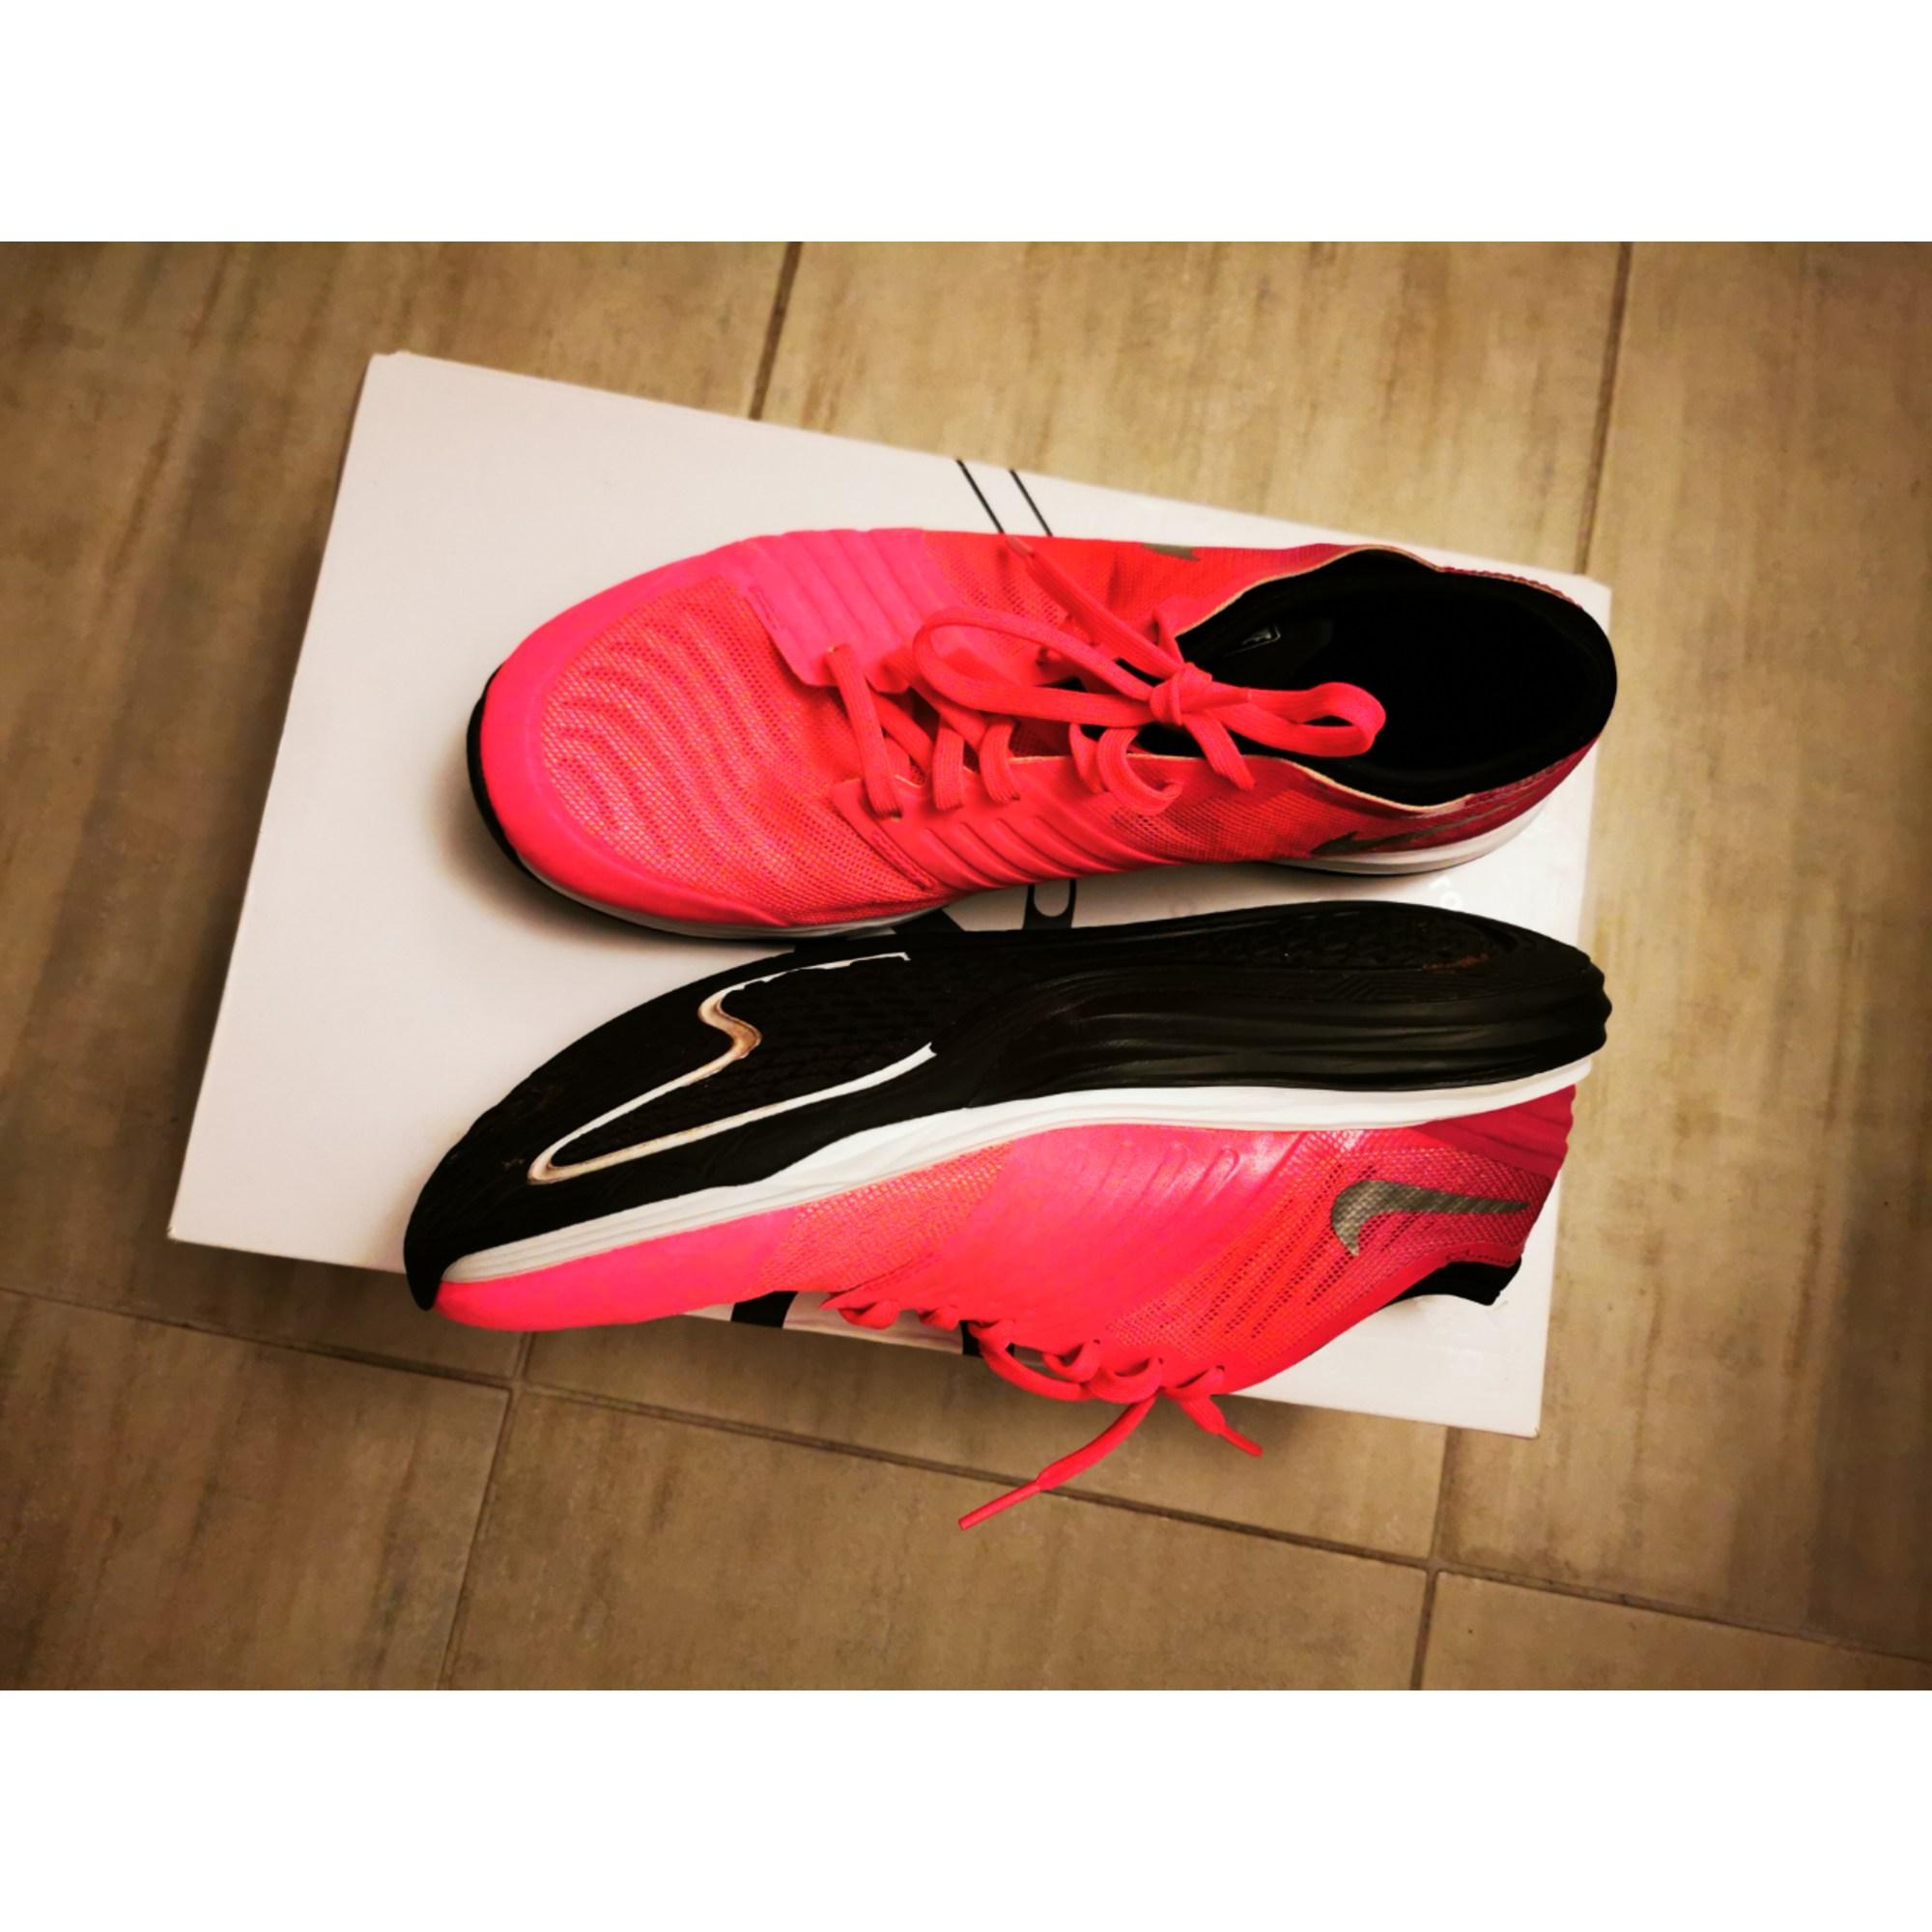 Chaussures de sport NIKE Rose, fuschia, vieux rose